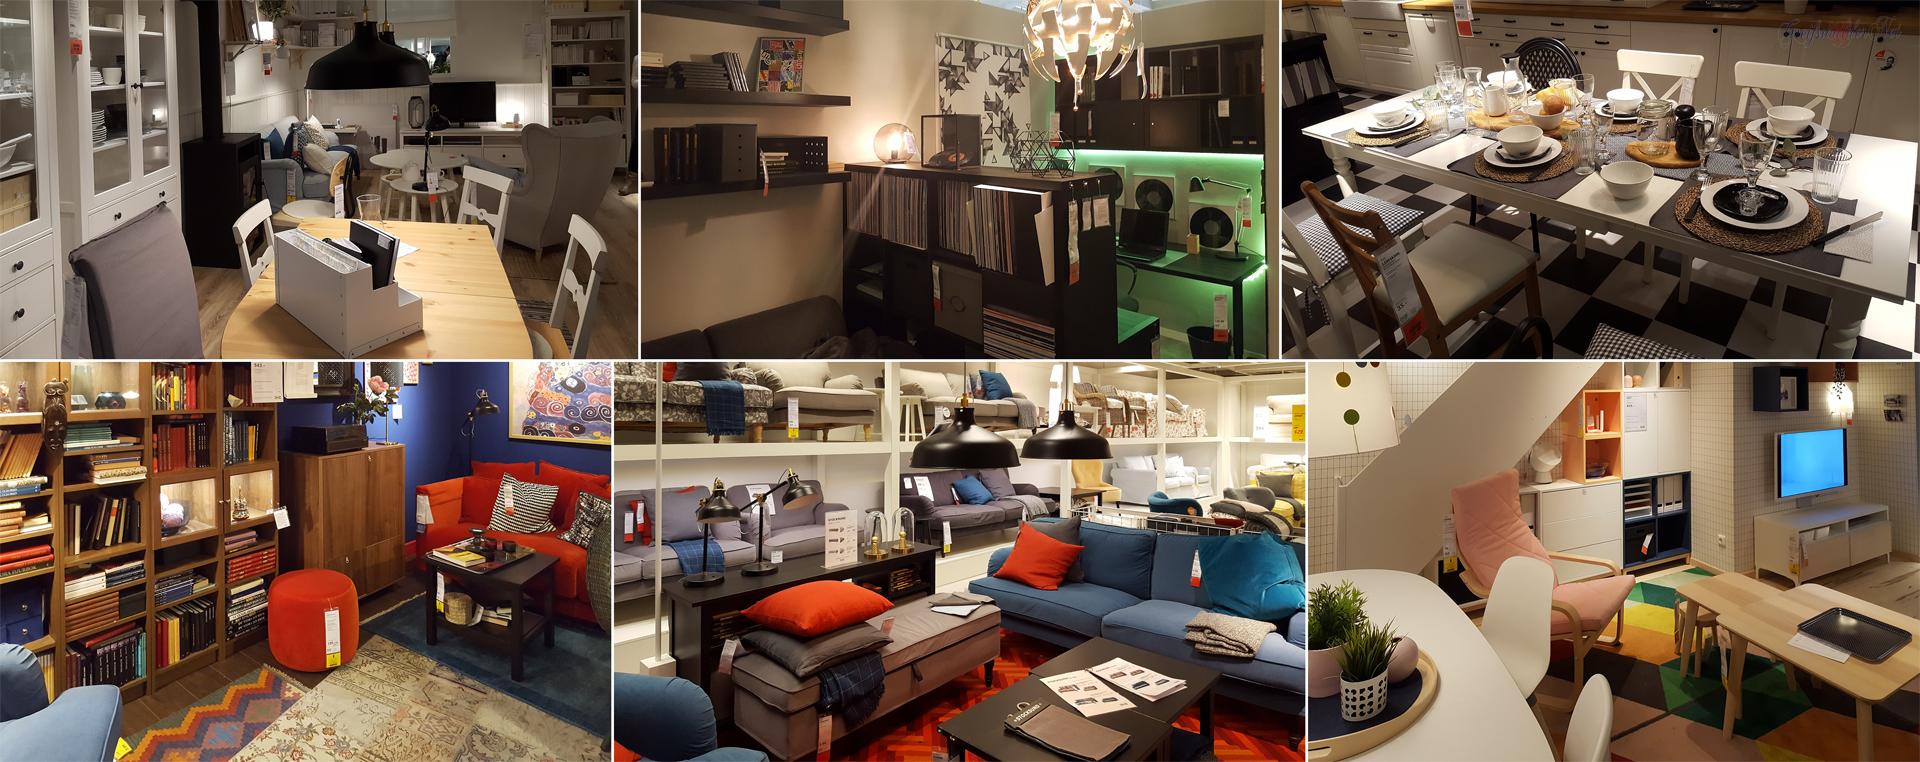 einkaufsbummel im ikea rostock greifswalder net. Black Bedroom Furniture Sets. Home Design Ideas